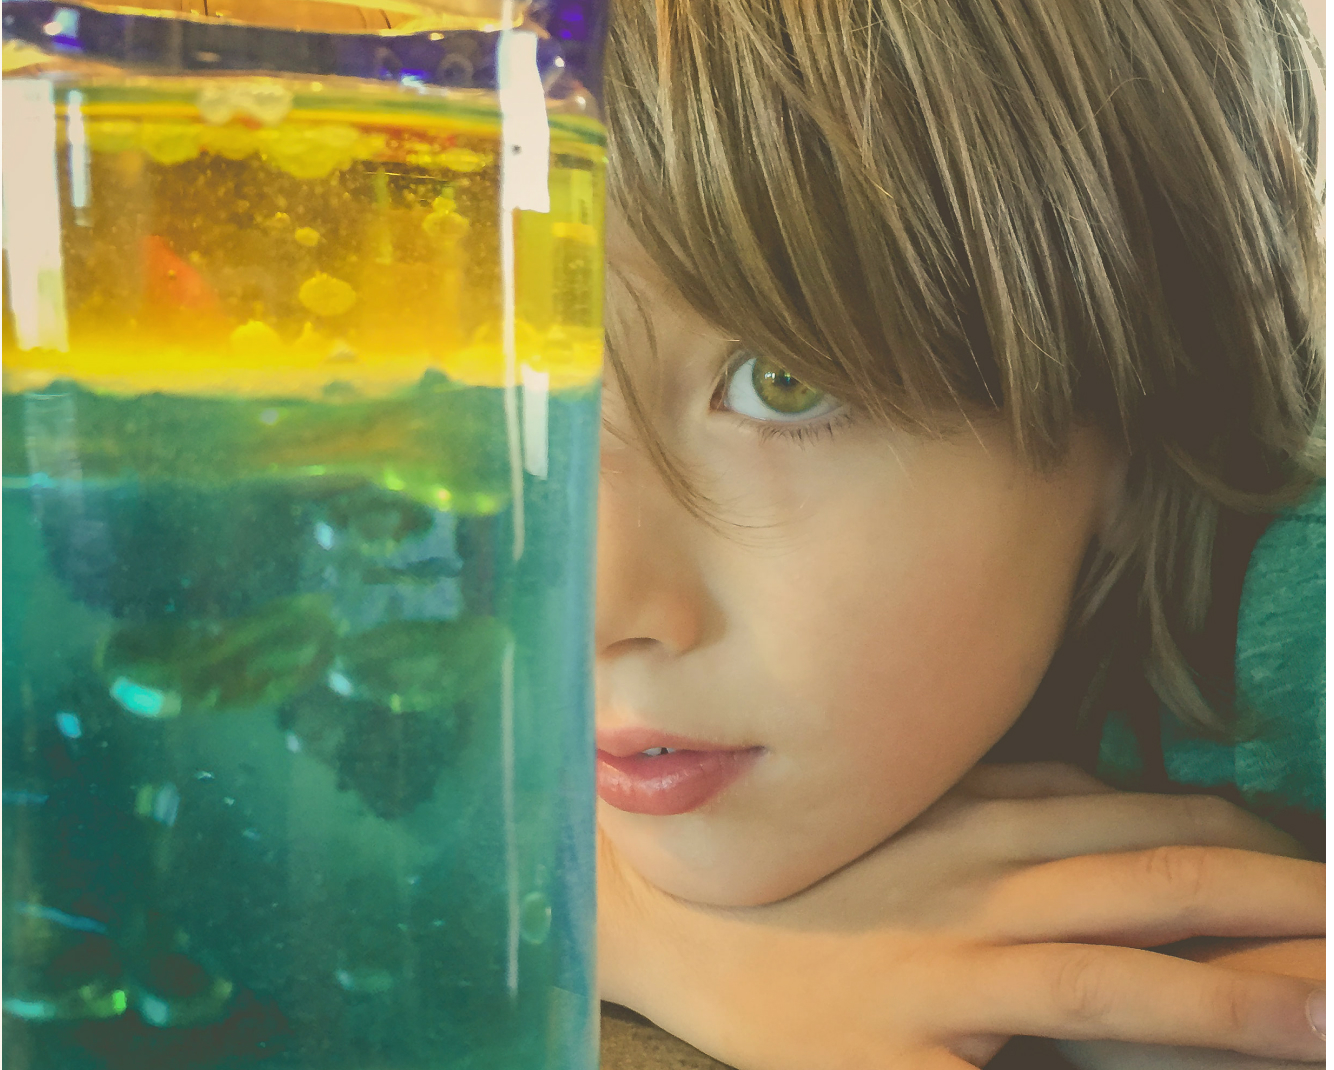 Young boy looking into an aquarium